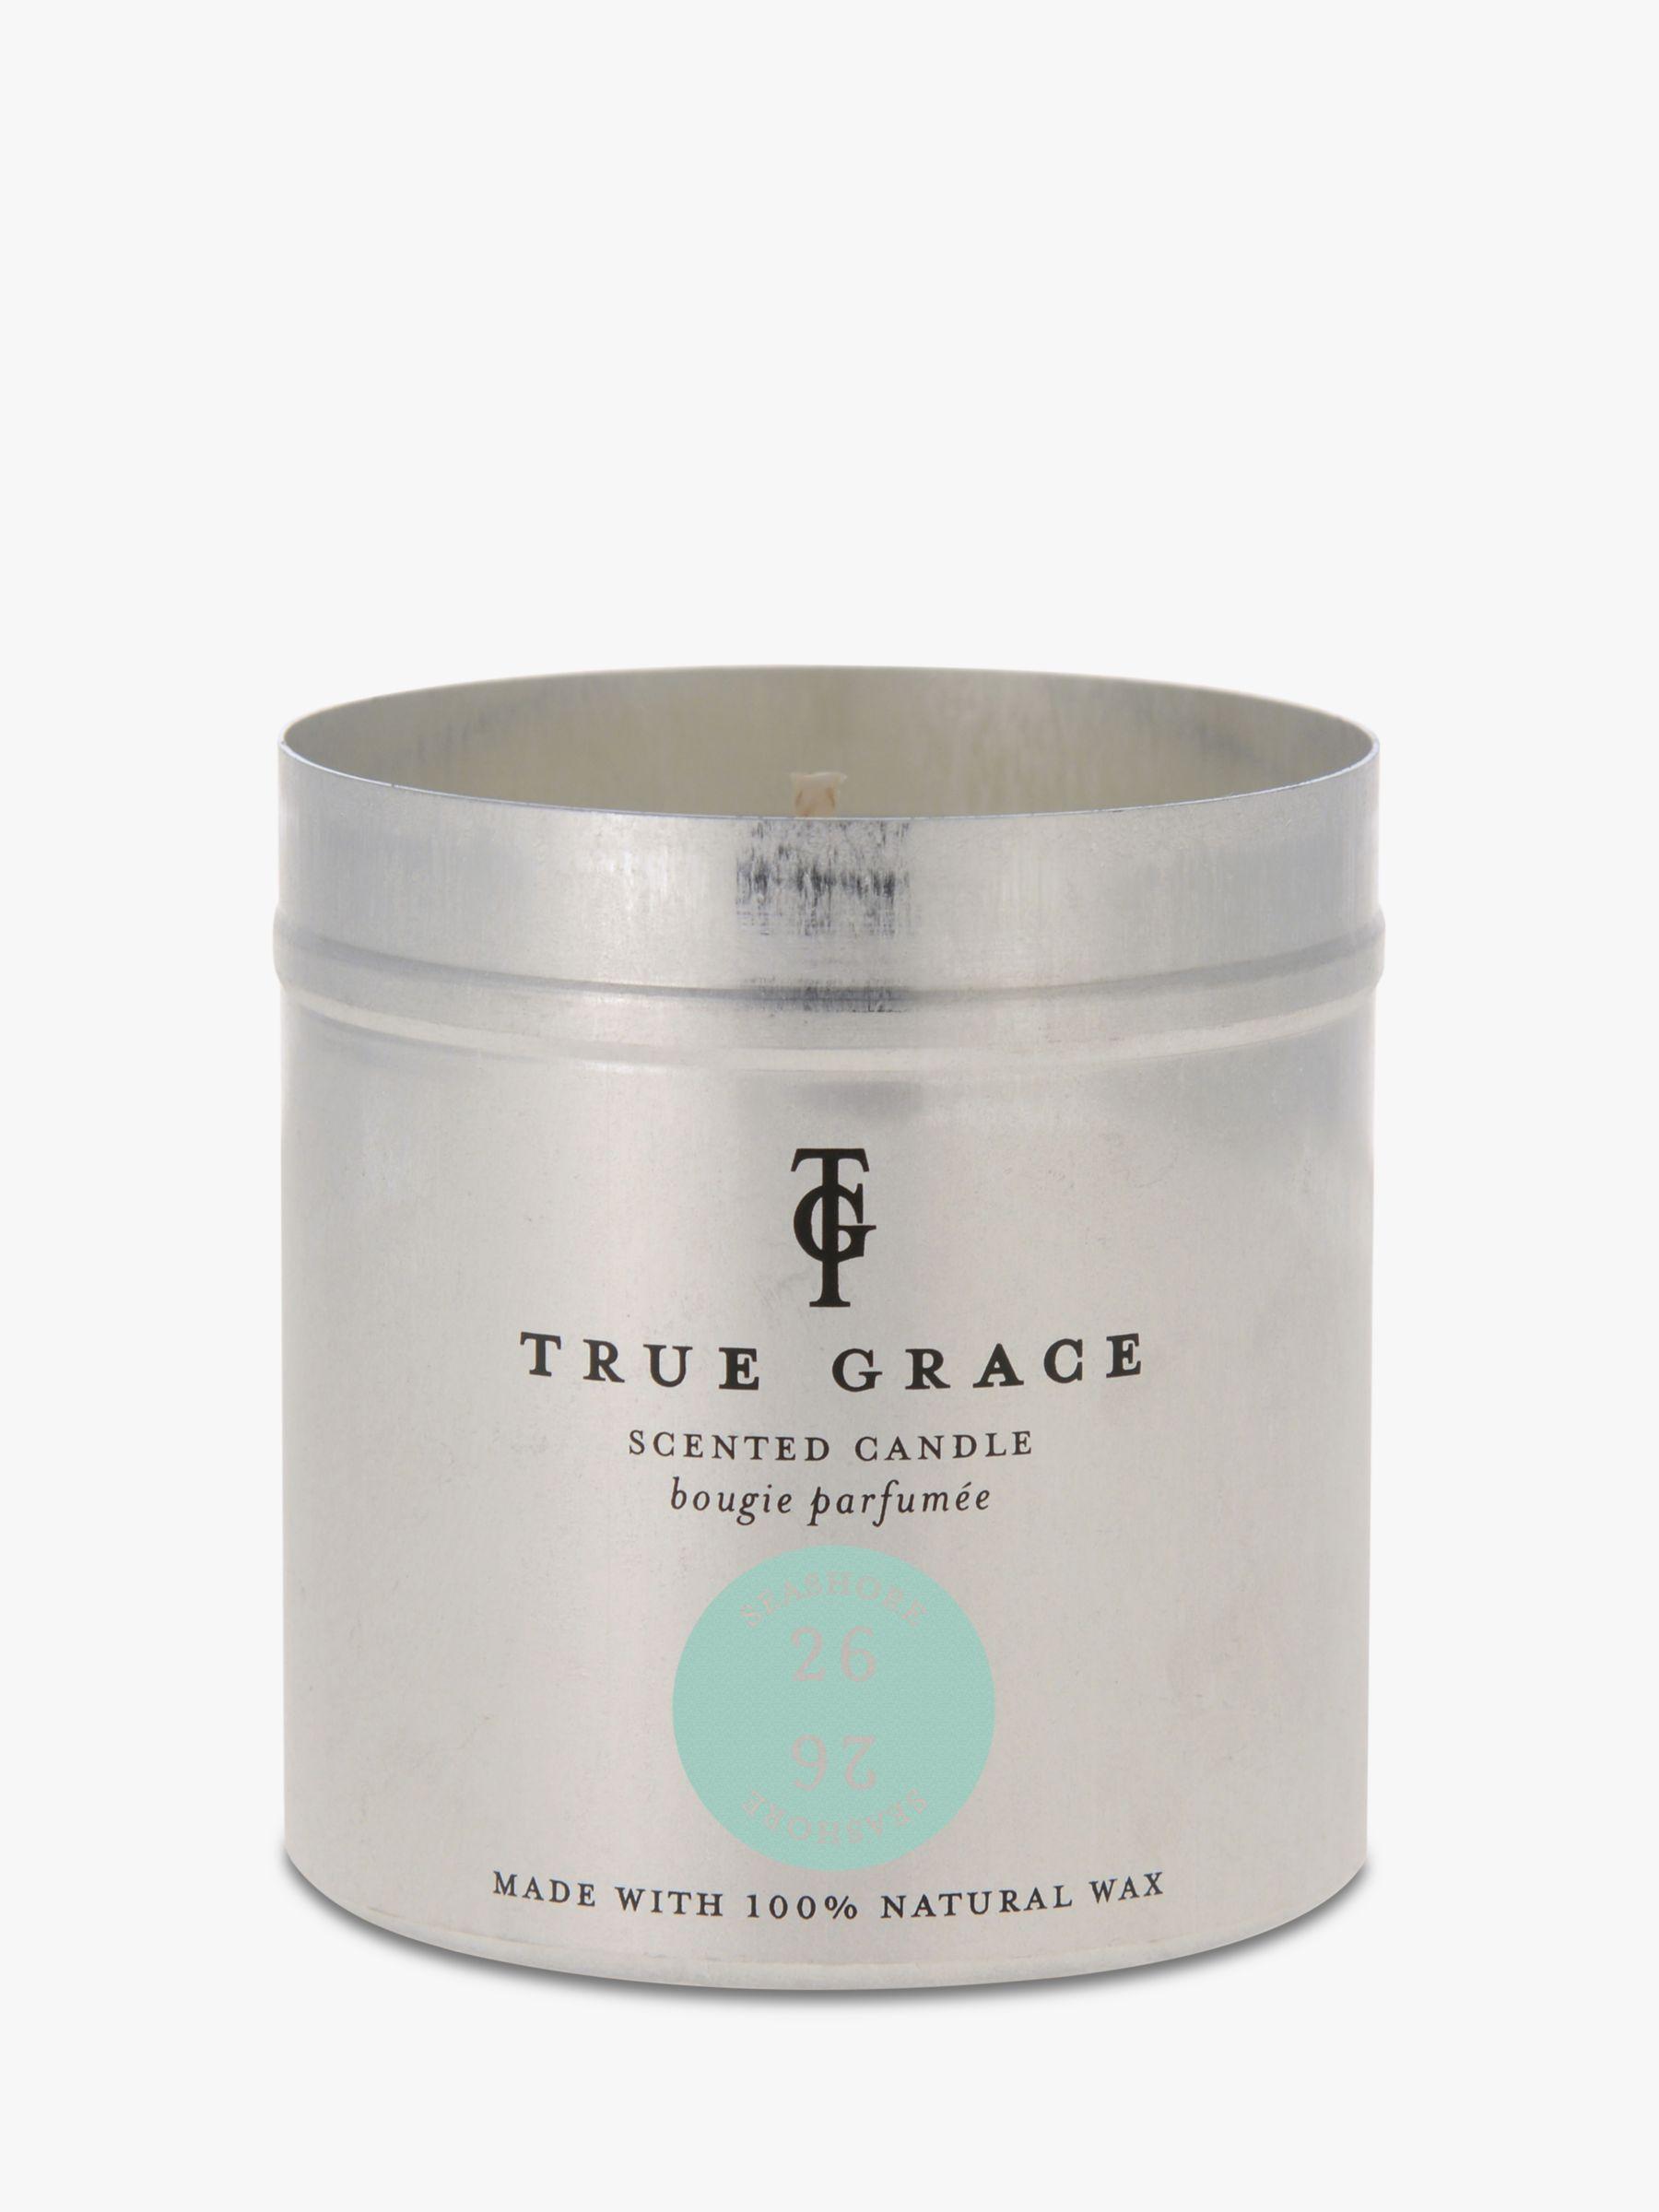 True Grace True Grace Village Seashore Scented Candle Tin